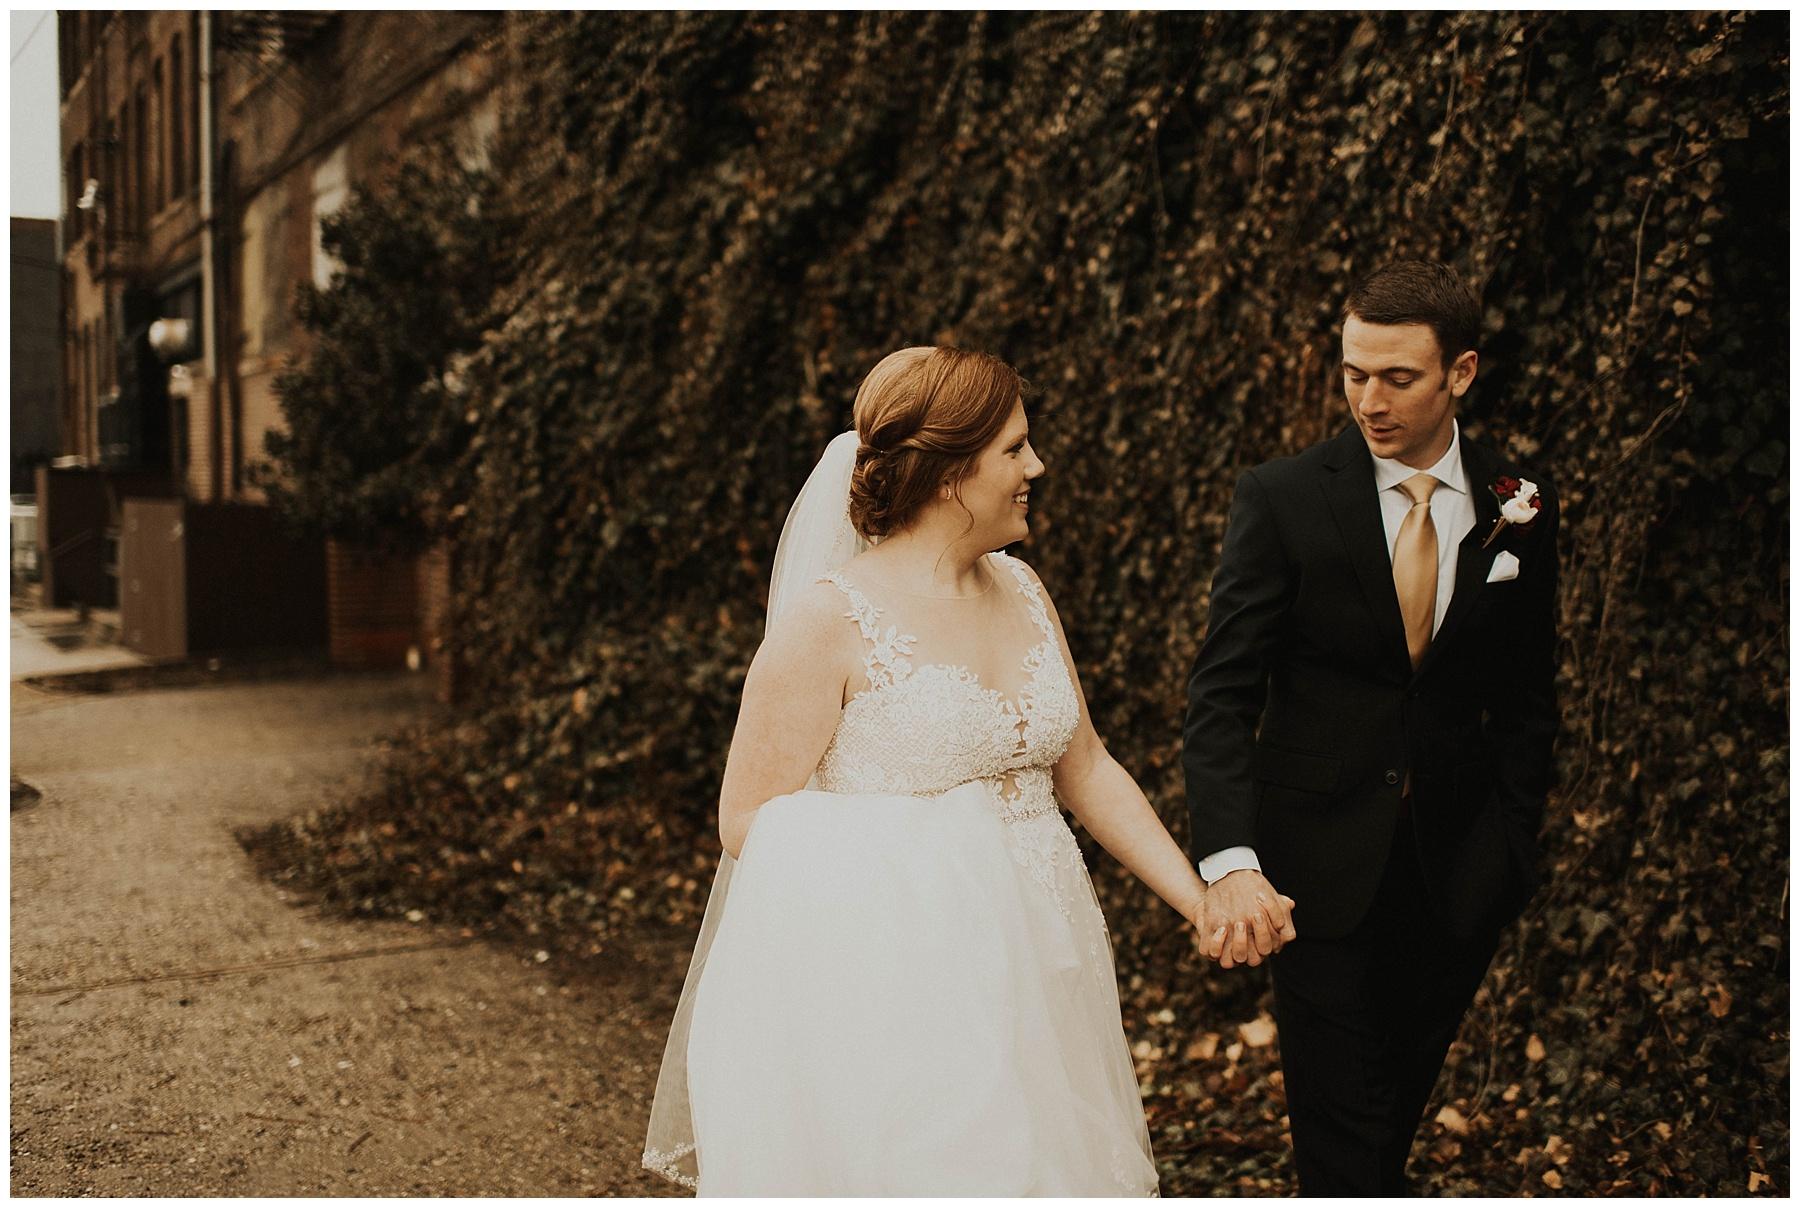 485ed47178bb Johnny + Eliza // Classic Winter Wedding - Lauren F.otography | Central  Illinois Wedding Photographer, Chicago Wedding Photographer, Peoria IL  Wedding ...